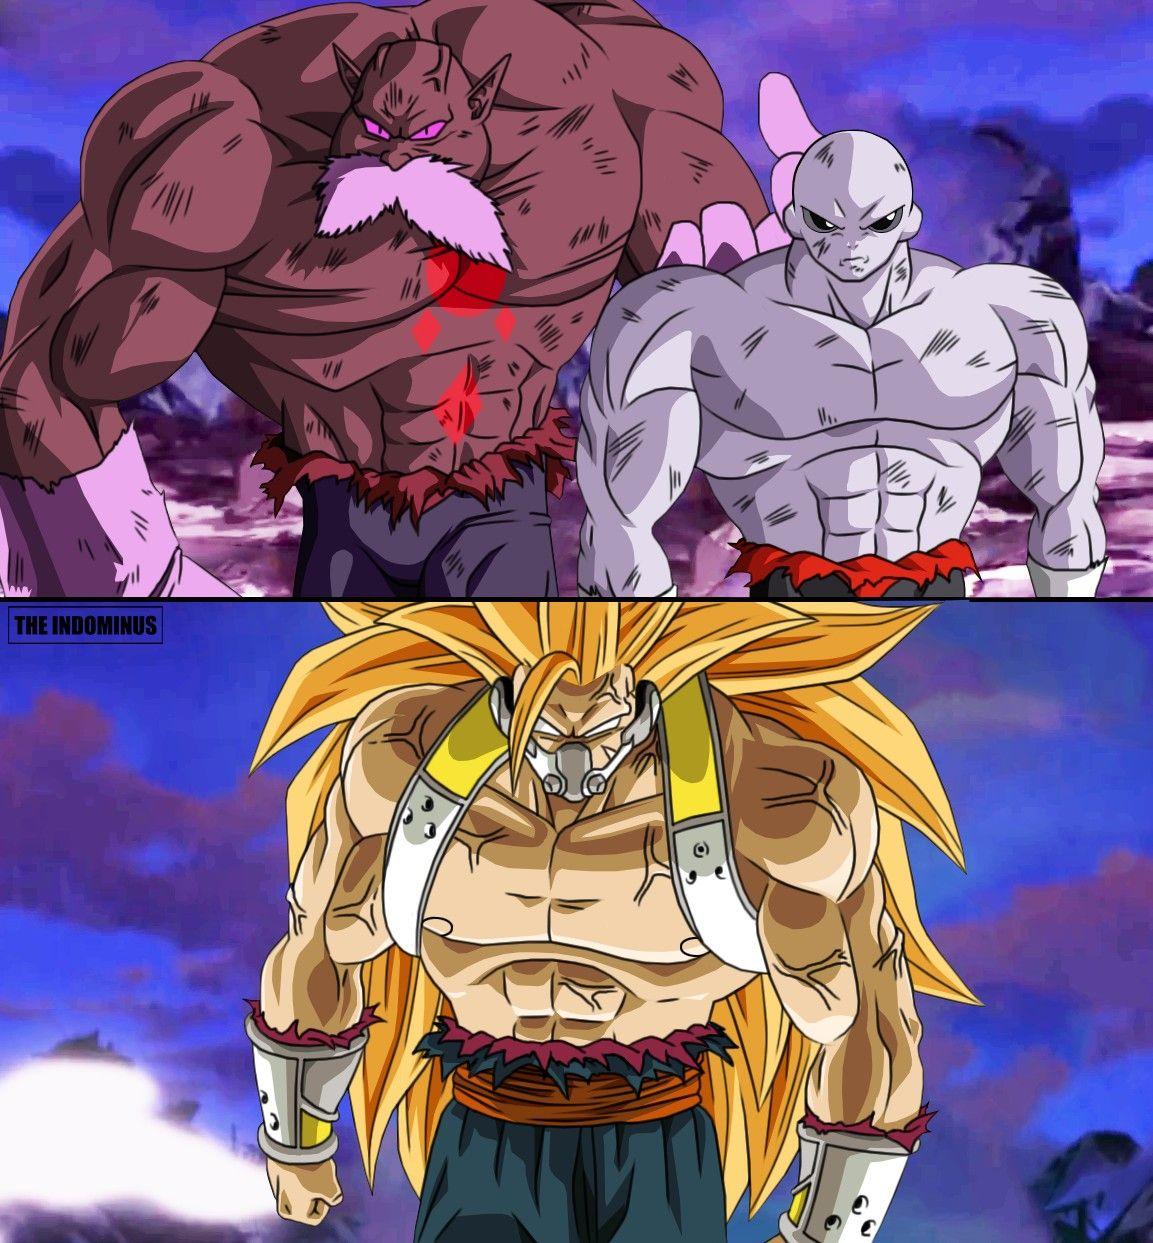 Toppo Y Jiren Vs Kanba Anime Dragon Ball Super Anime Dragon Ball Dragon Ball Super Goku